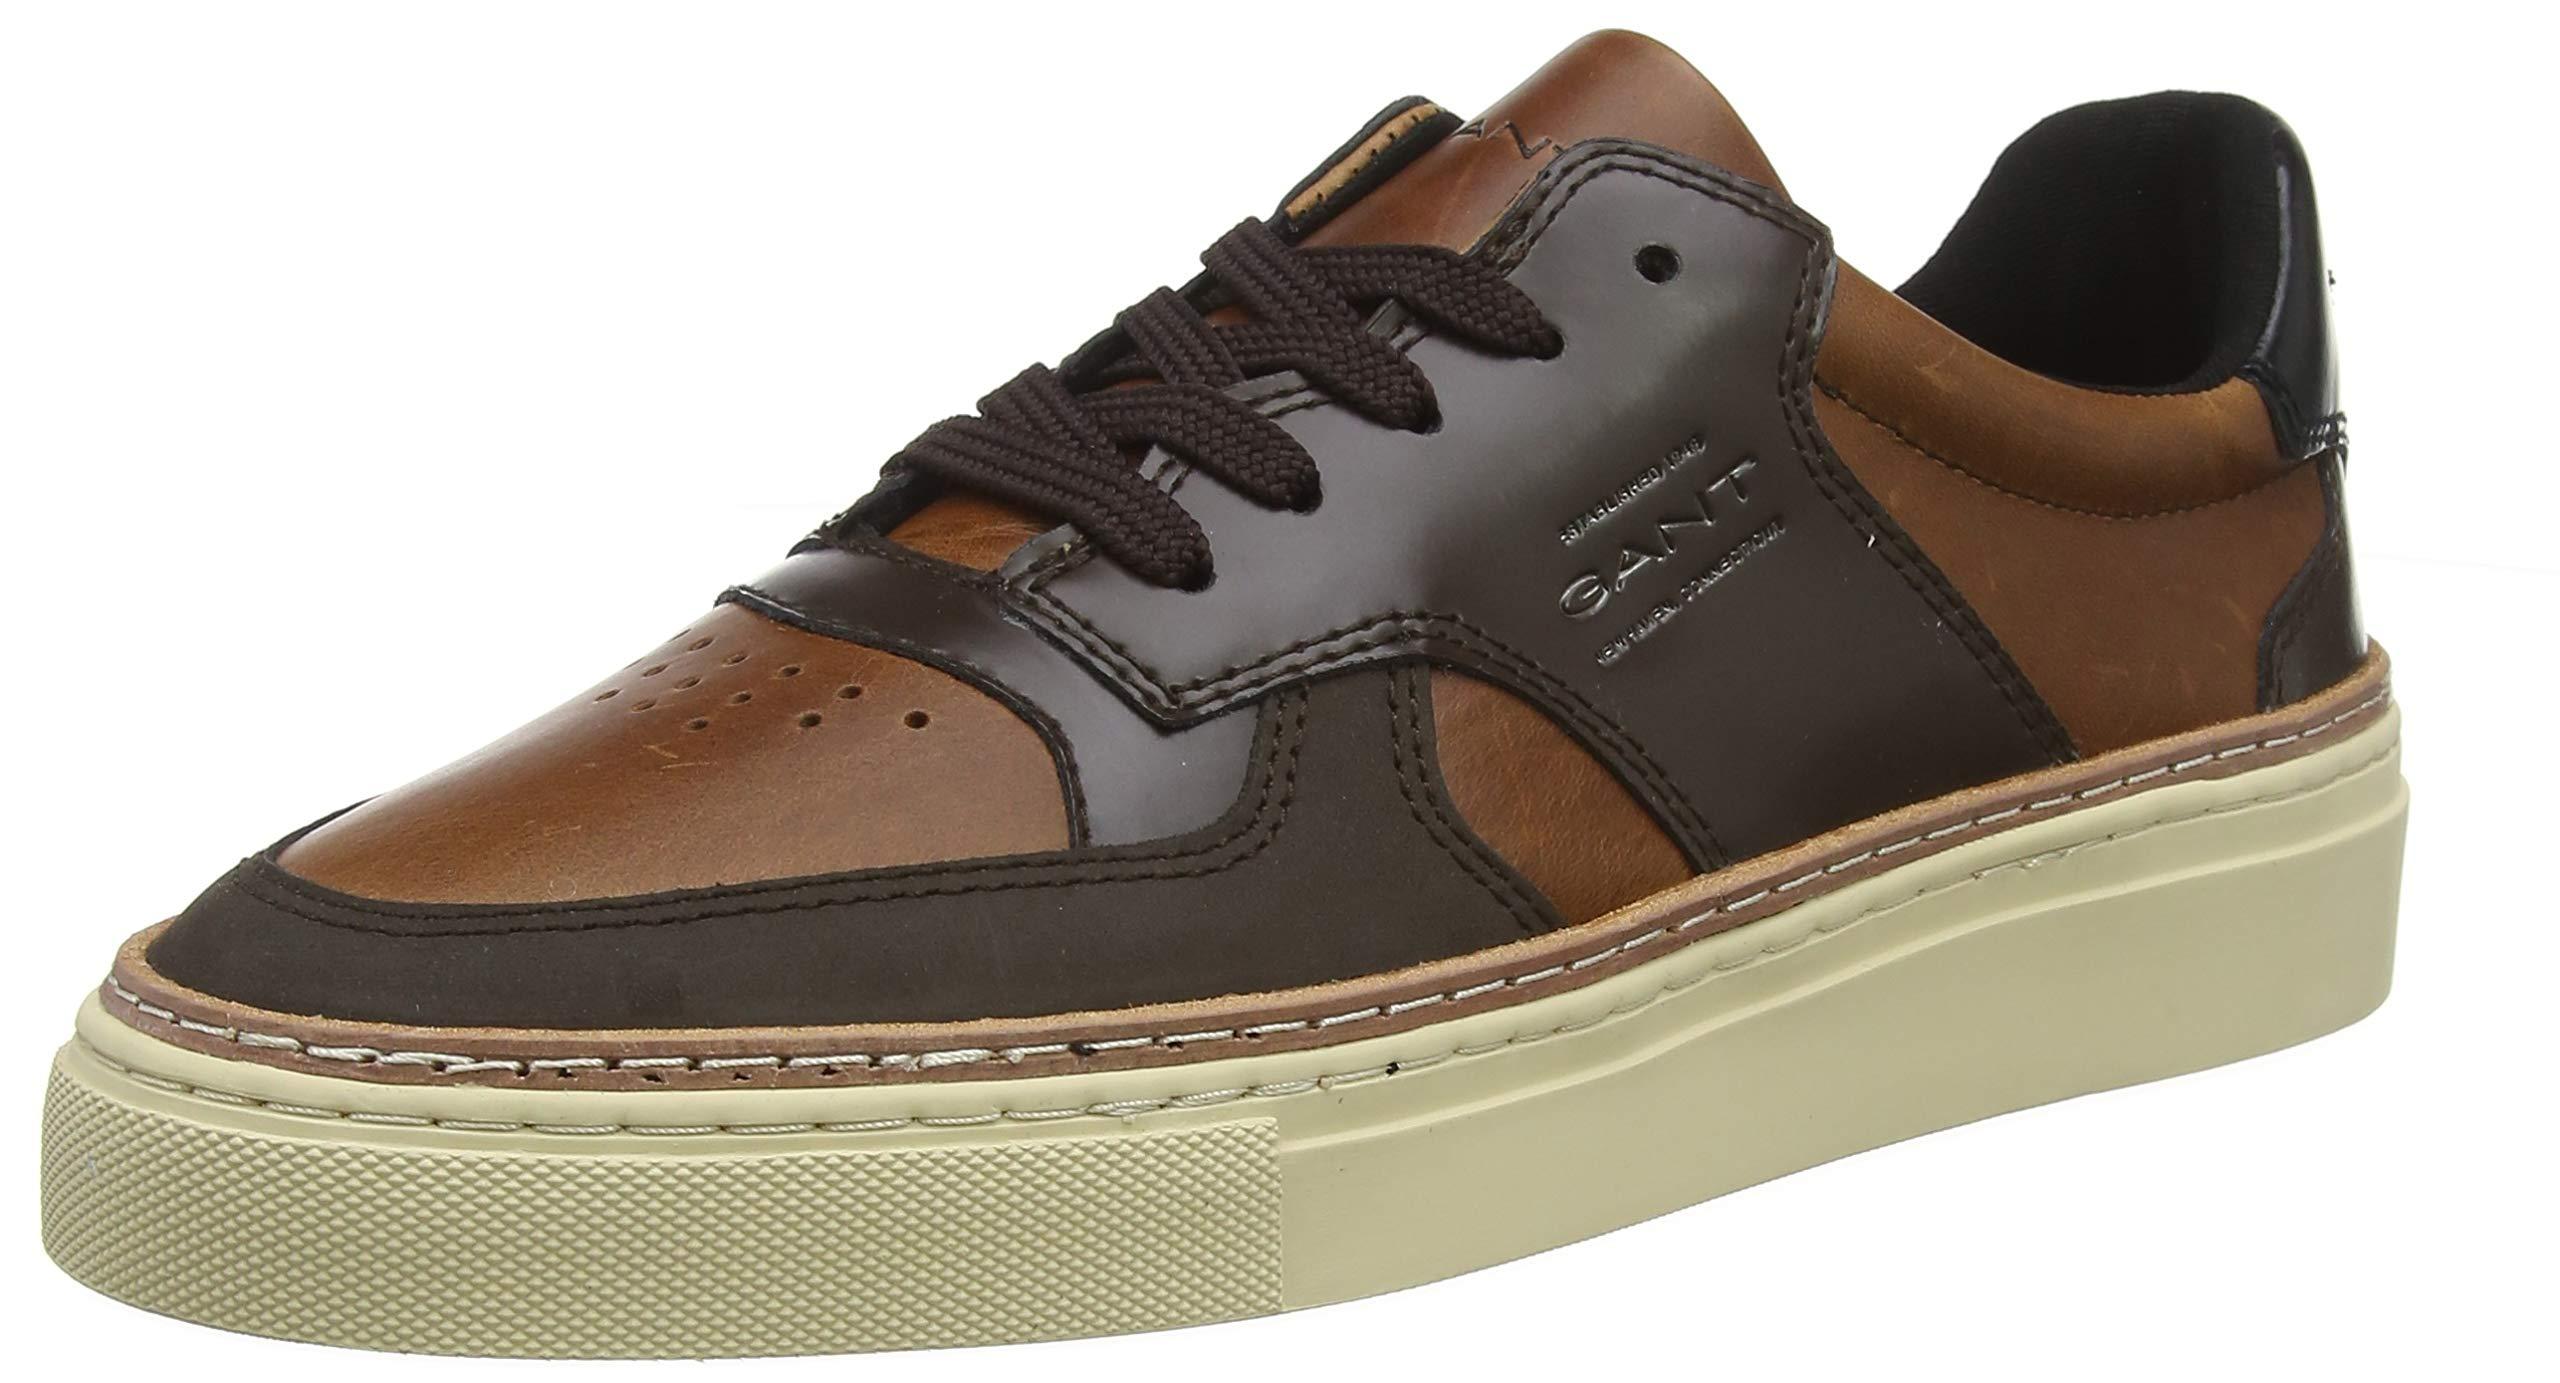 G45743 cognac DenverBrogues HommeMulticoloreespresso Gant Footwear Eu T1FcKlJ